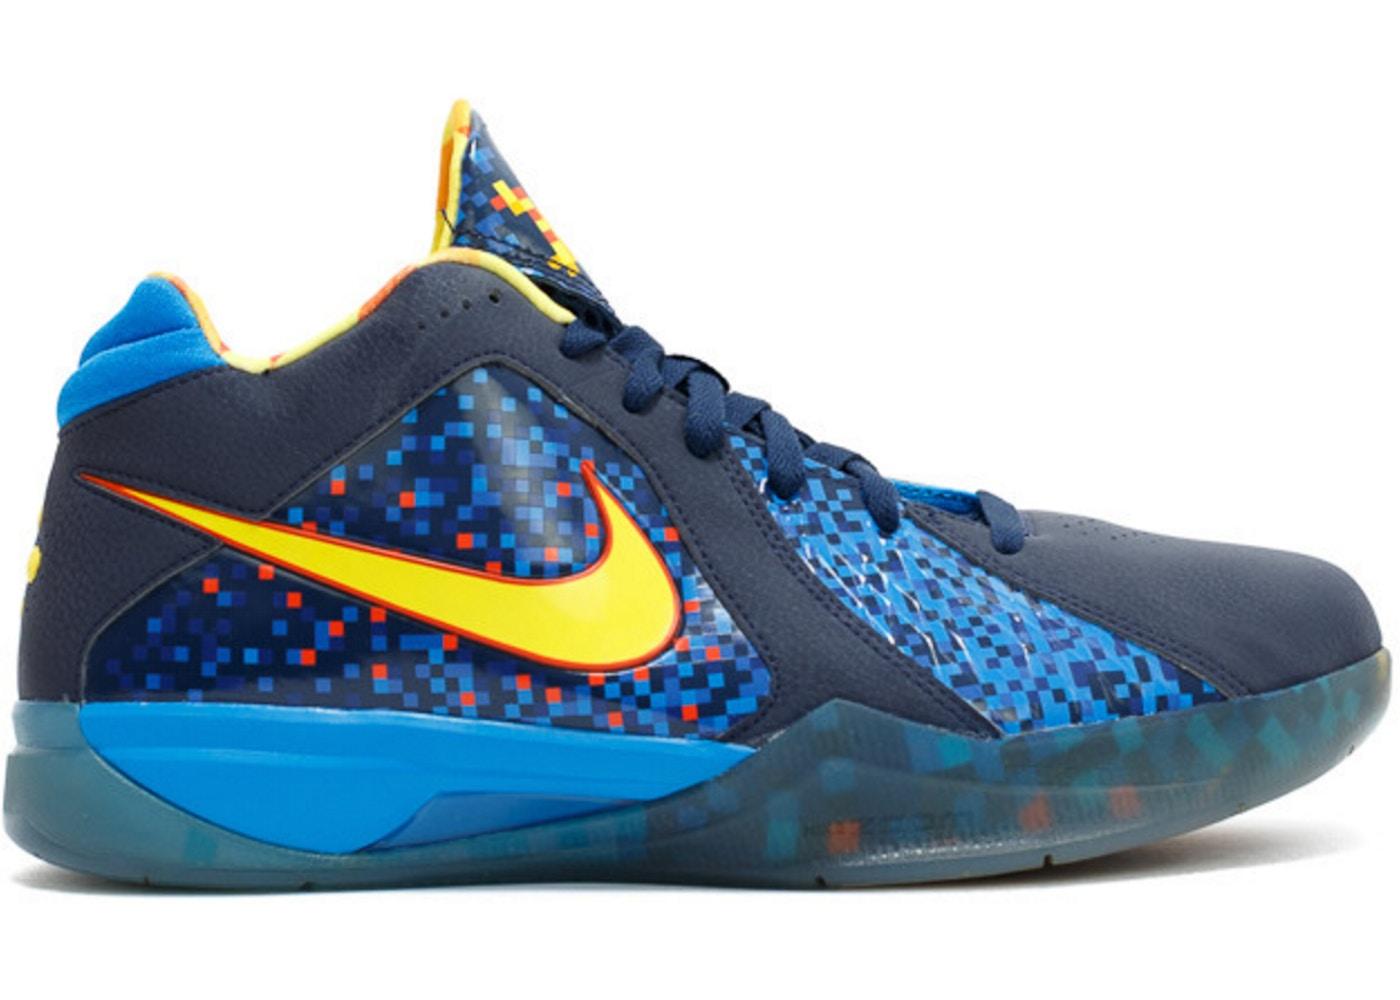 Nike KD Shoes - Price Premium